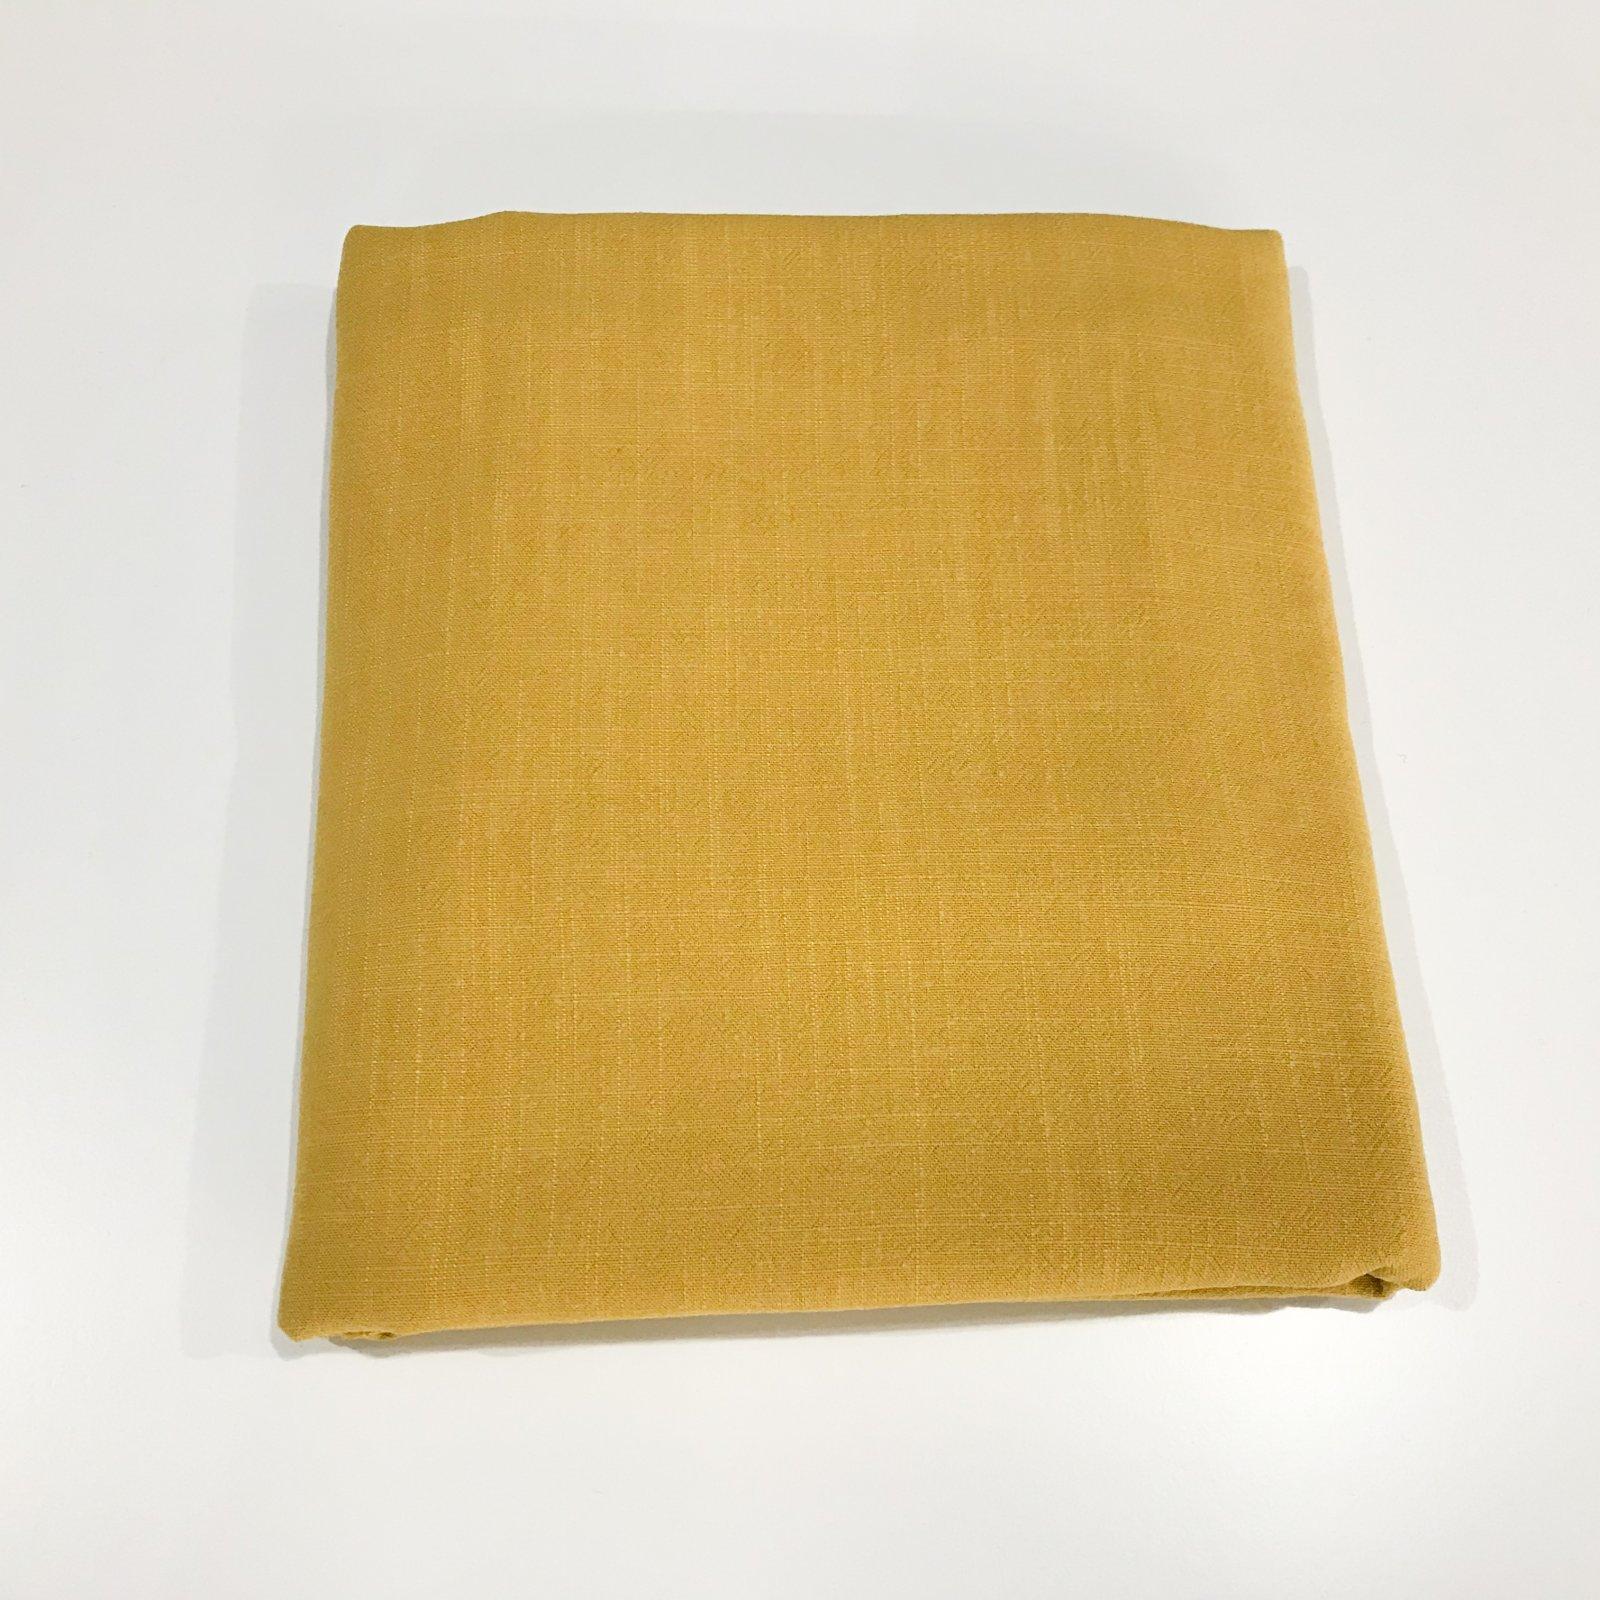 1 5/8 yards - Grace Viscose and Linen Blend - Mustard